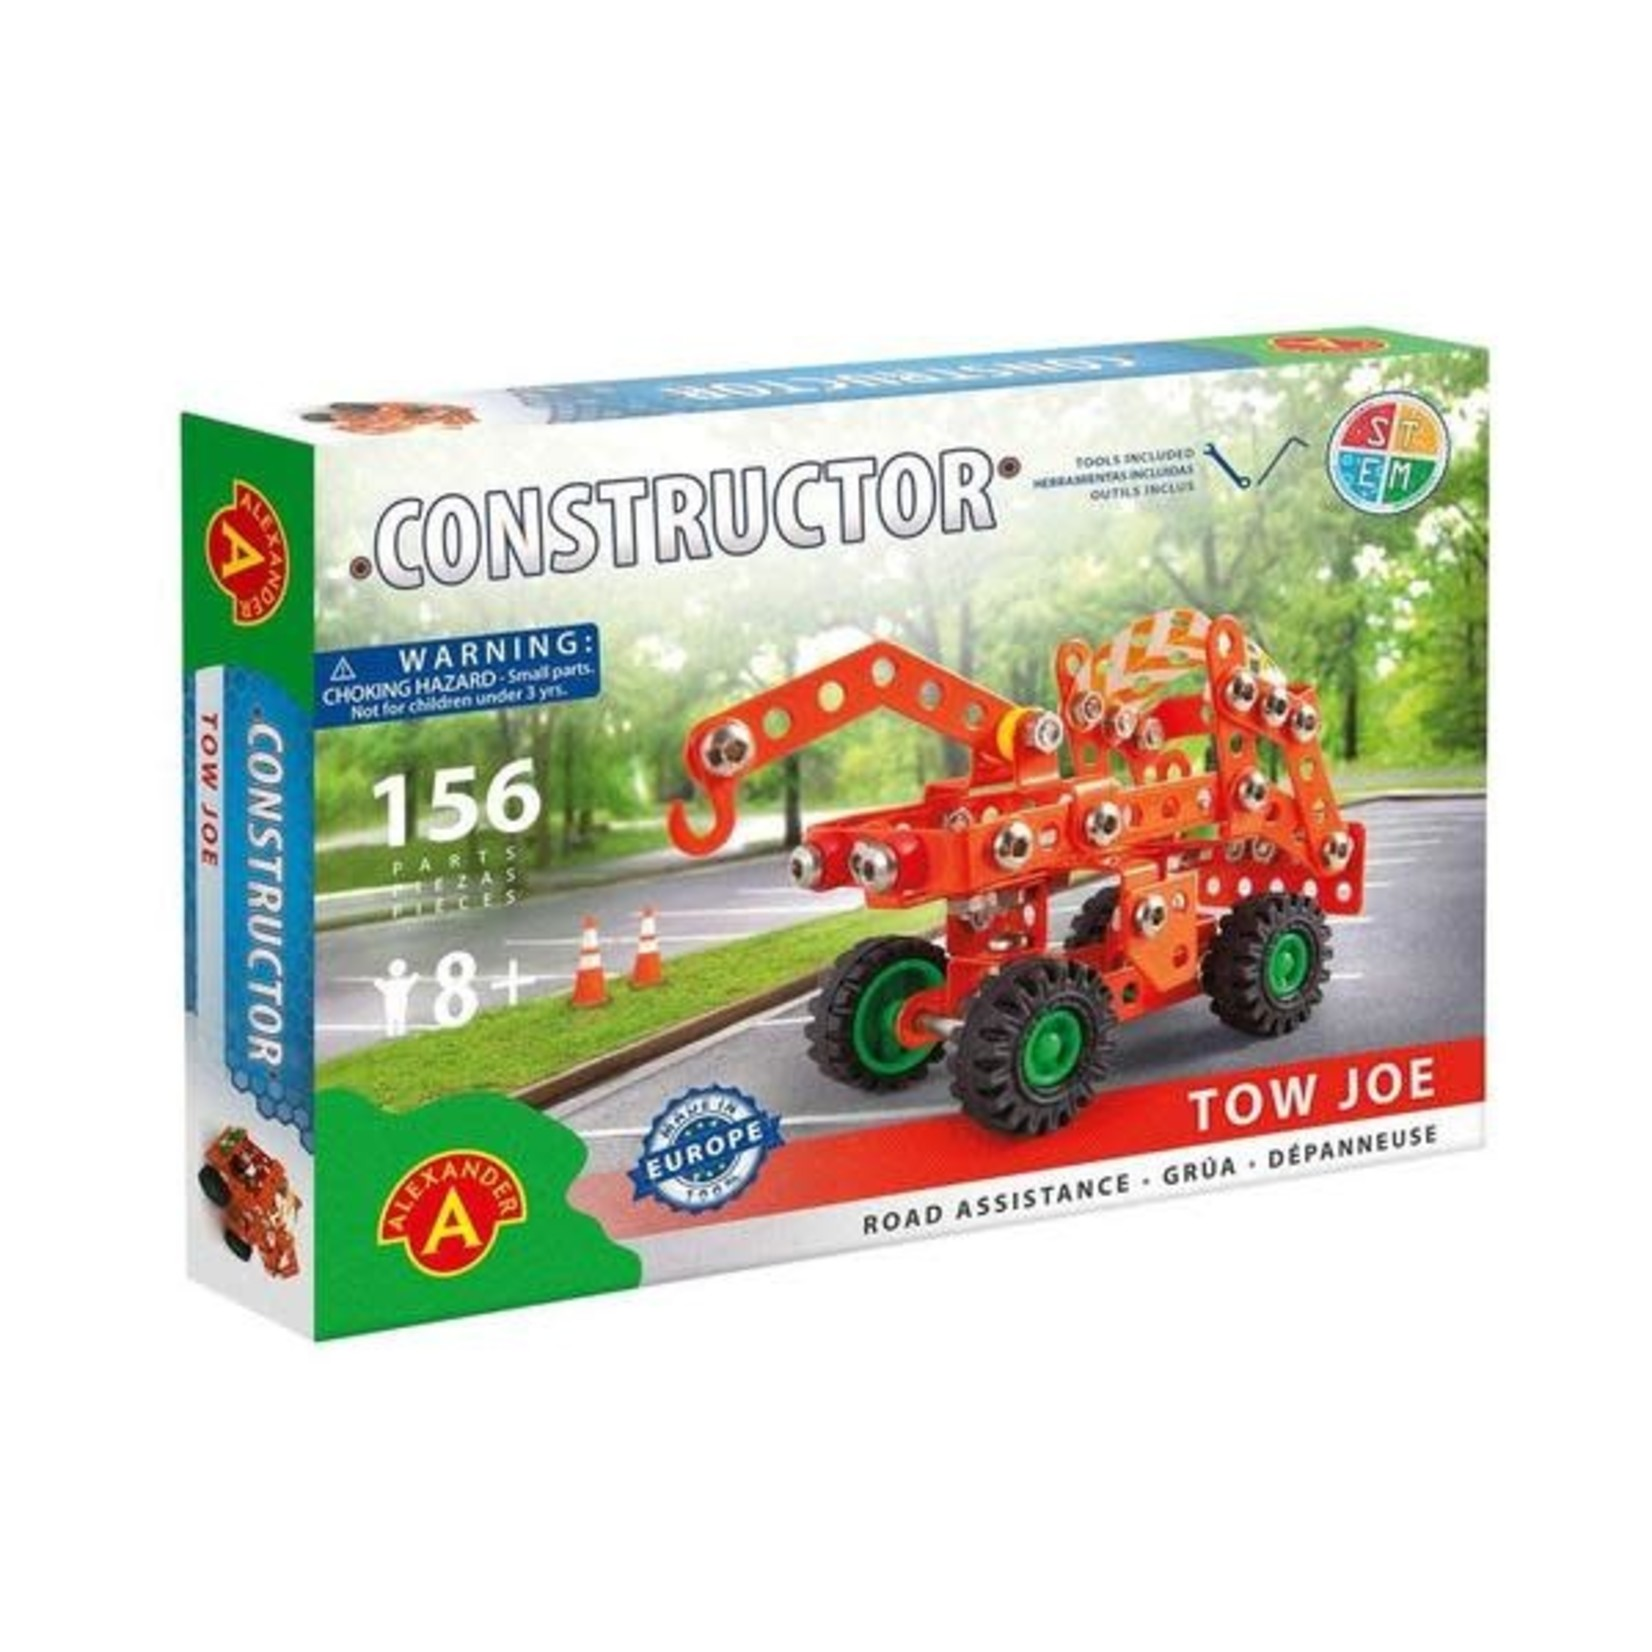 Alexander Constructor : Tow Joe Pick Up